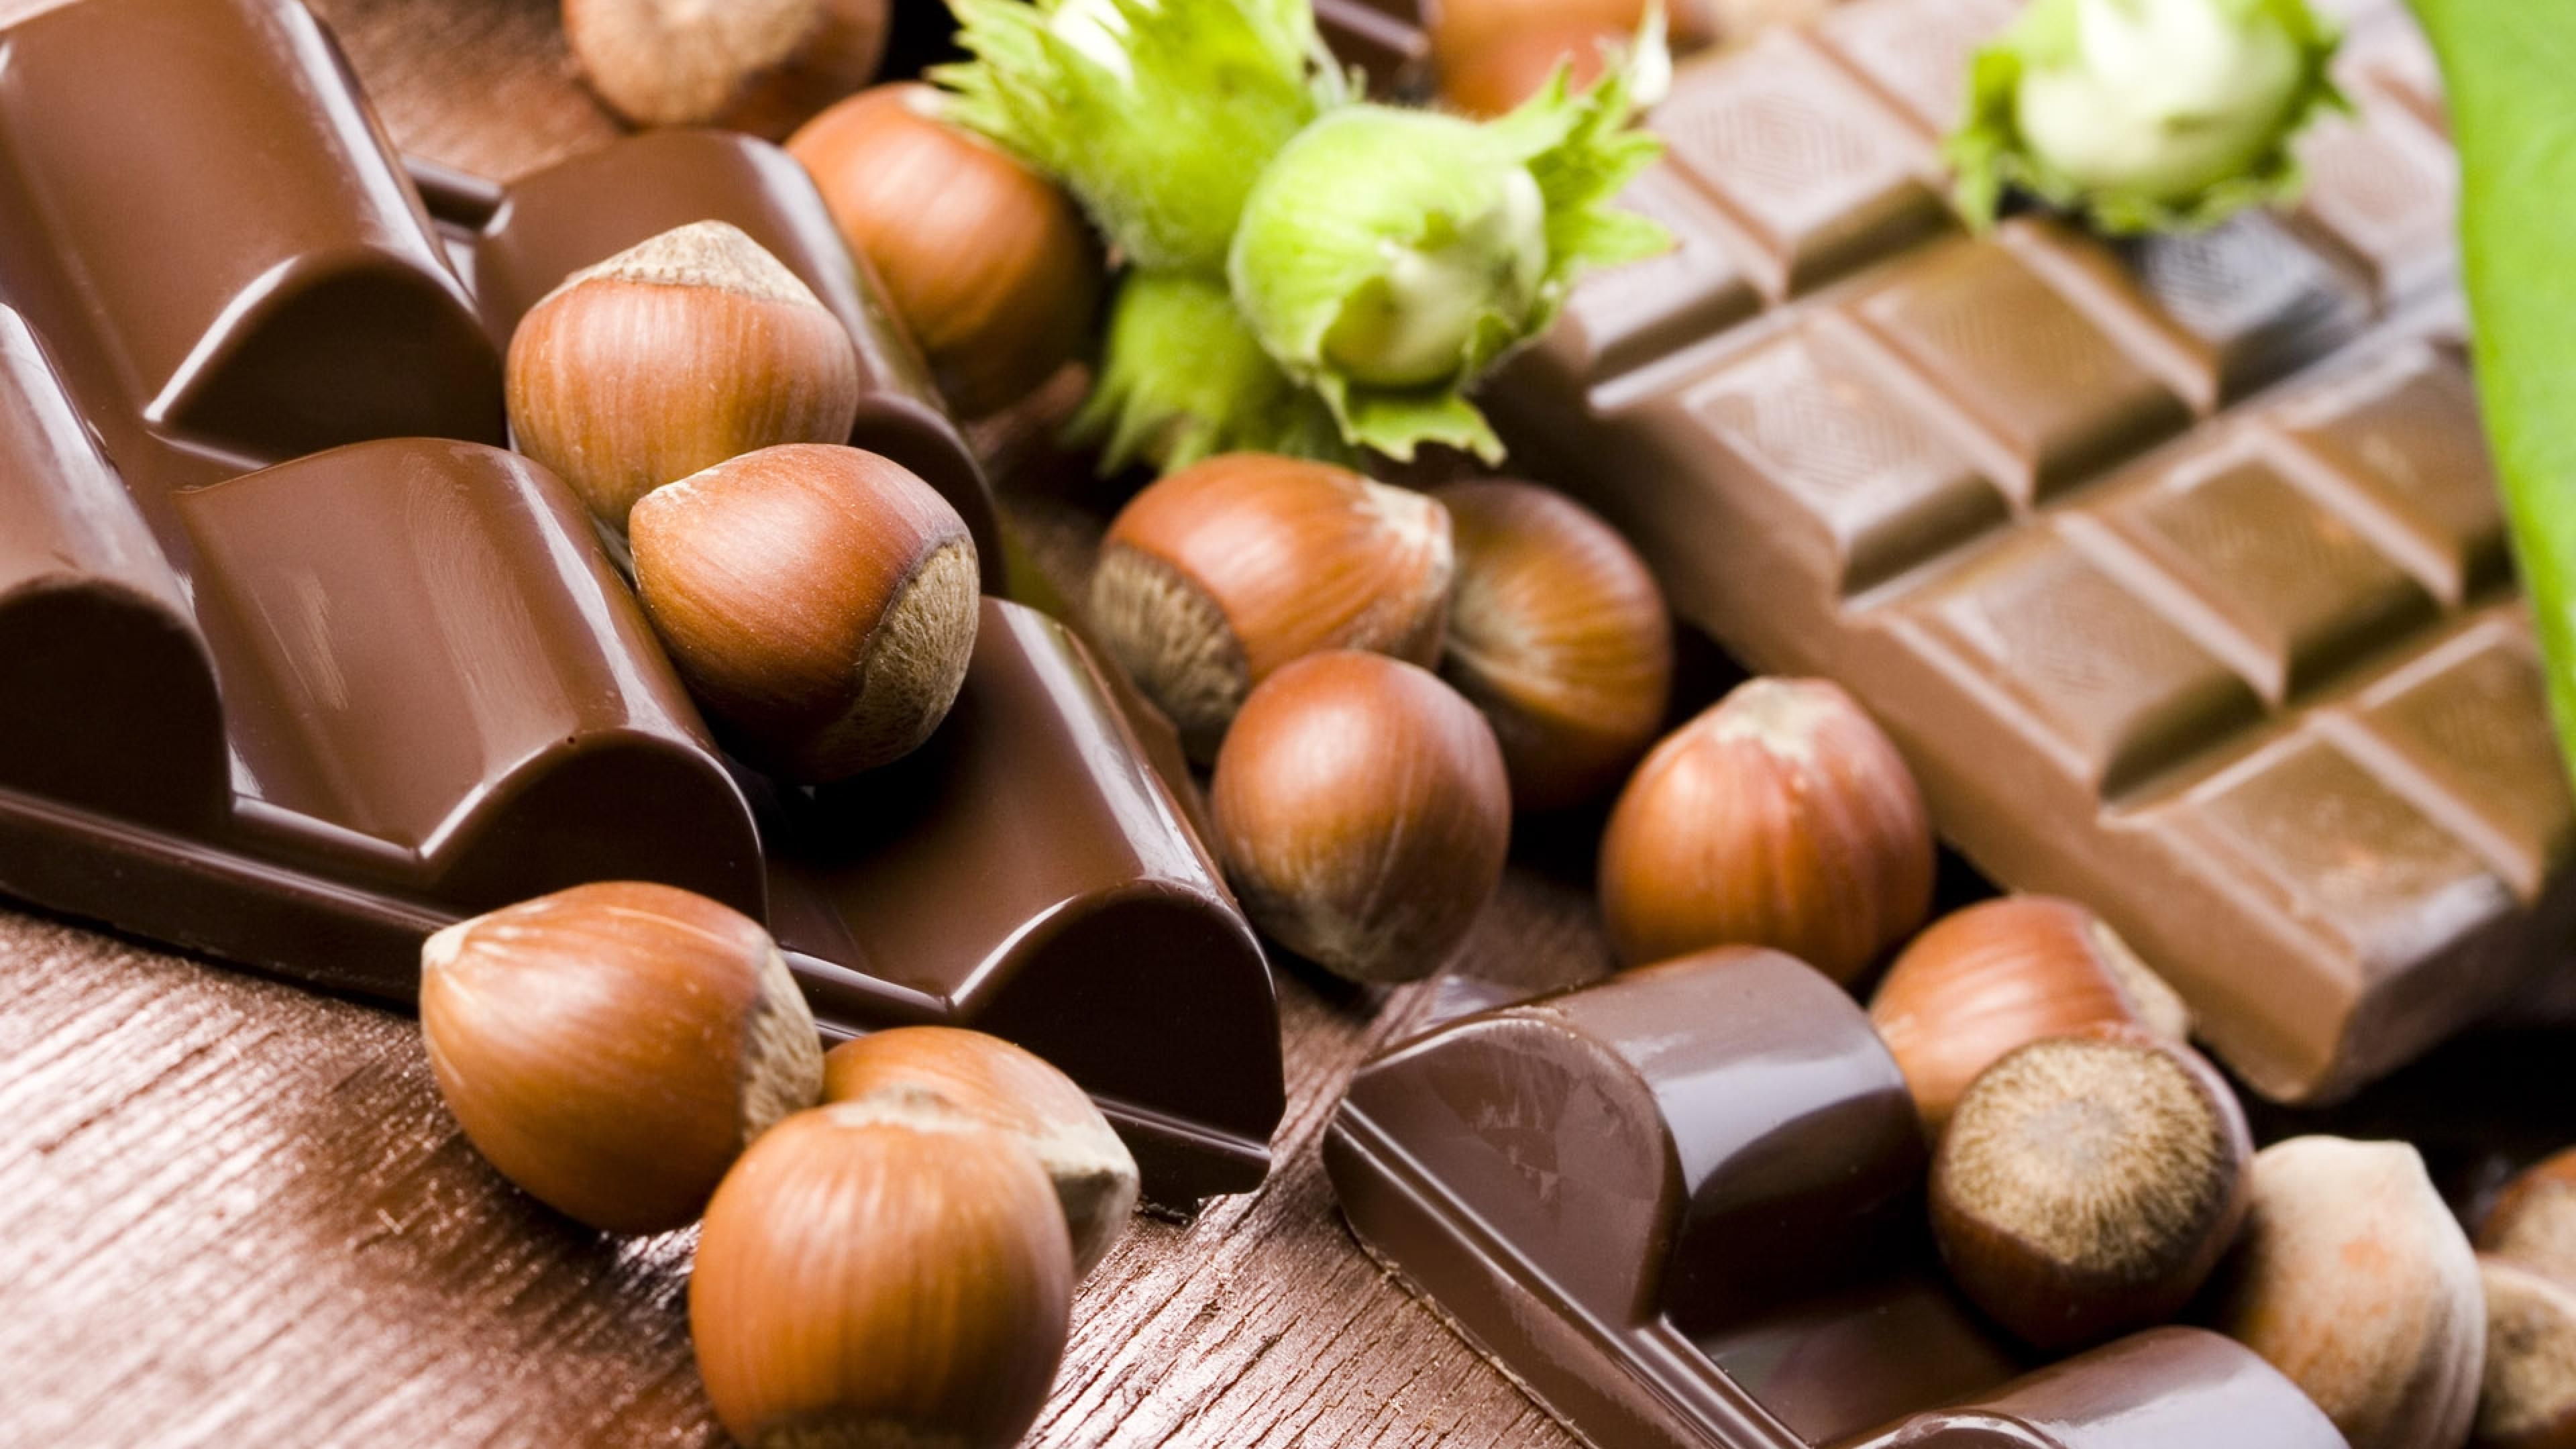 Schokolade Teilen